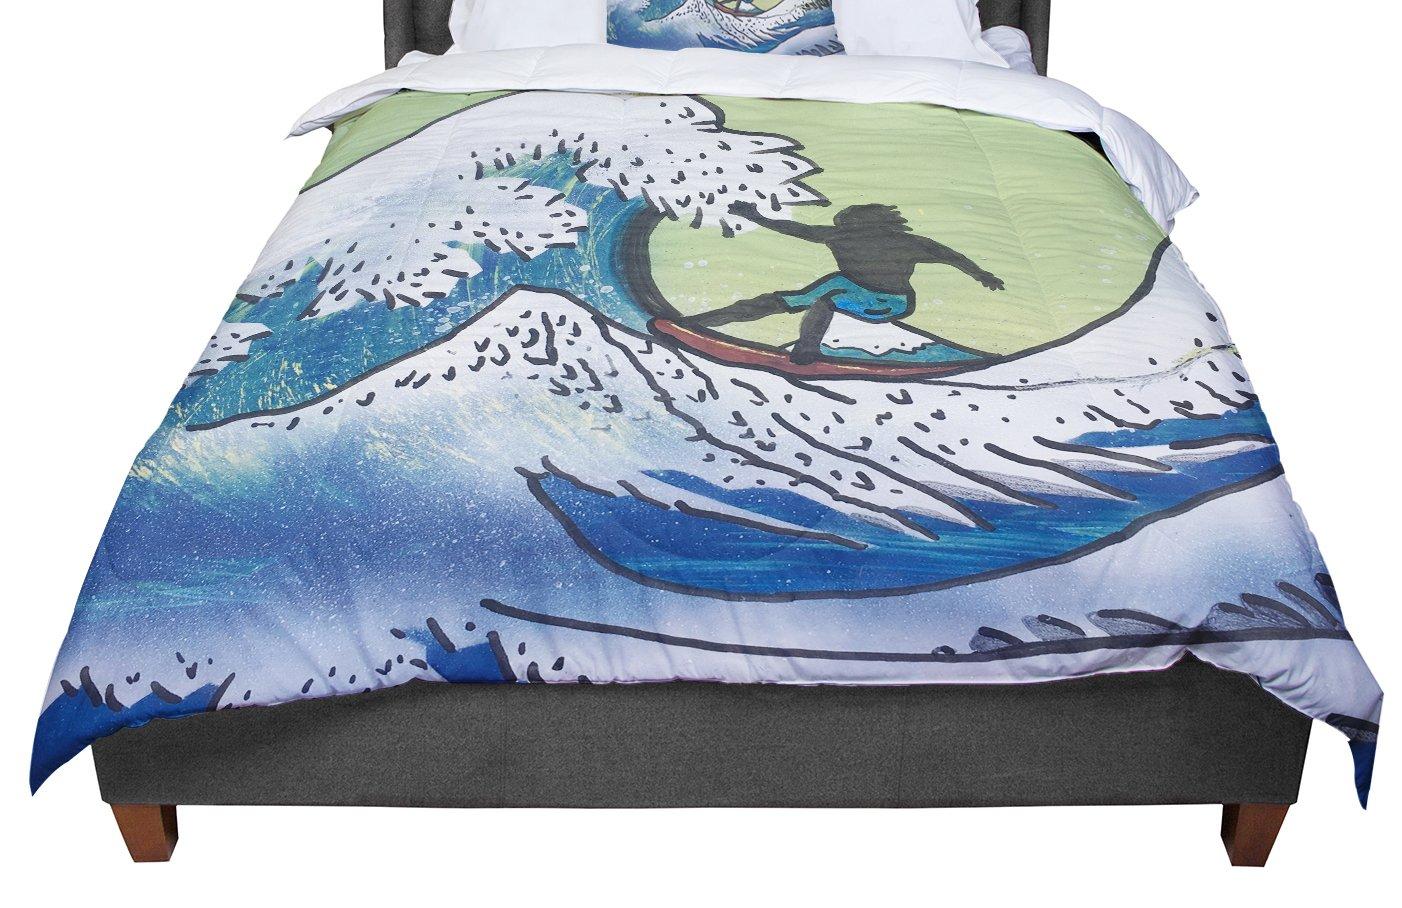 Cal King Comforter 104 X 88 KESS InHouse Infinite Spray Art Hokusai Remake Blue Green King